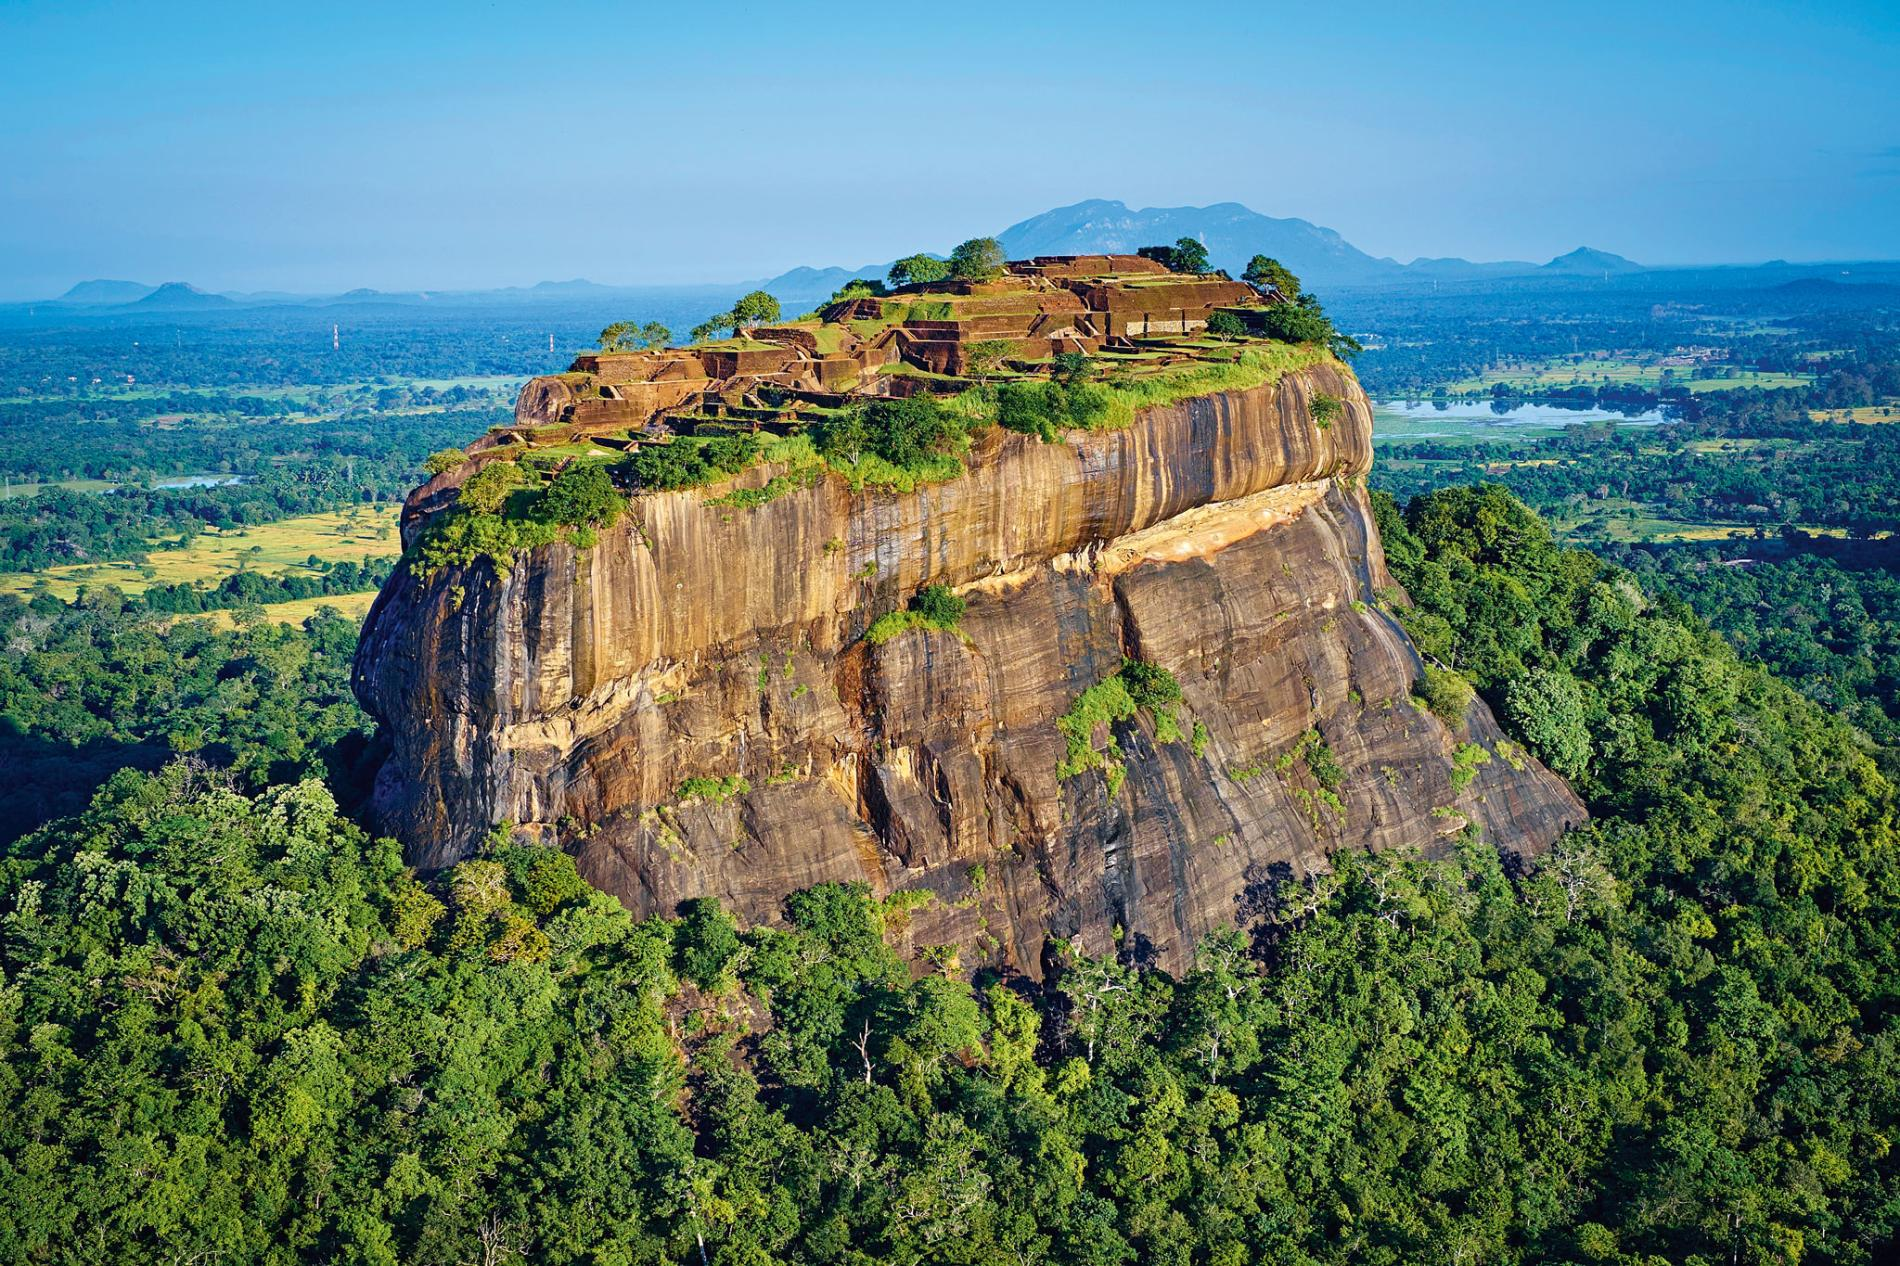 Sigiriya_La Fortezza del Leone